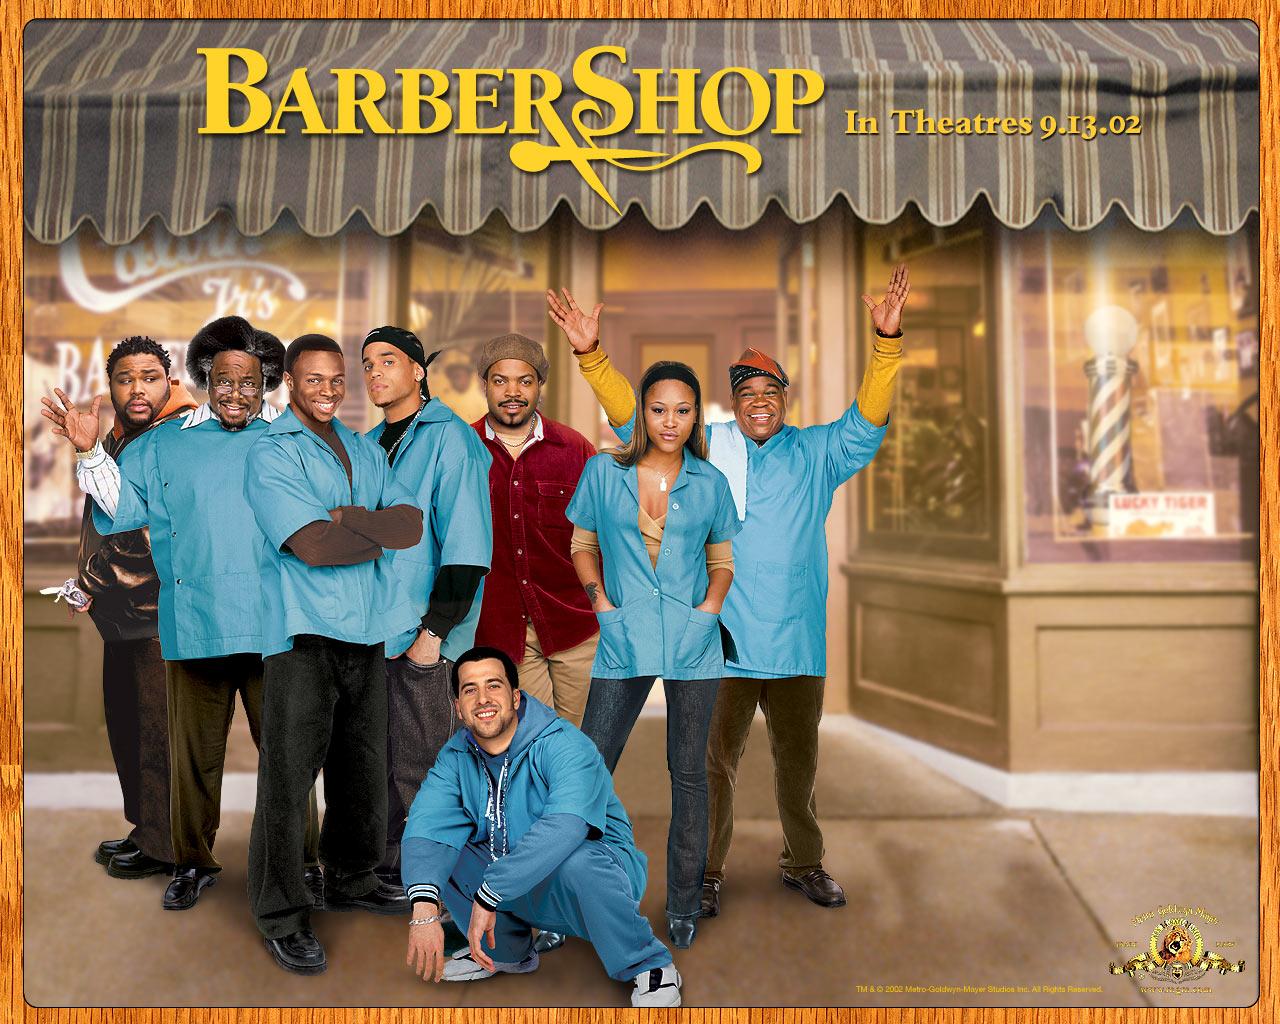 Barbershop Free Desktop Wallpapers for HD, Widescreen and Mobile